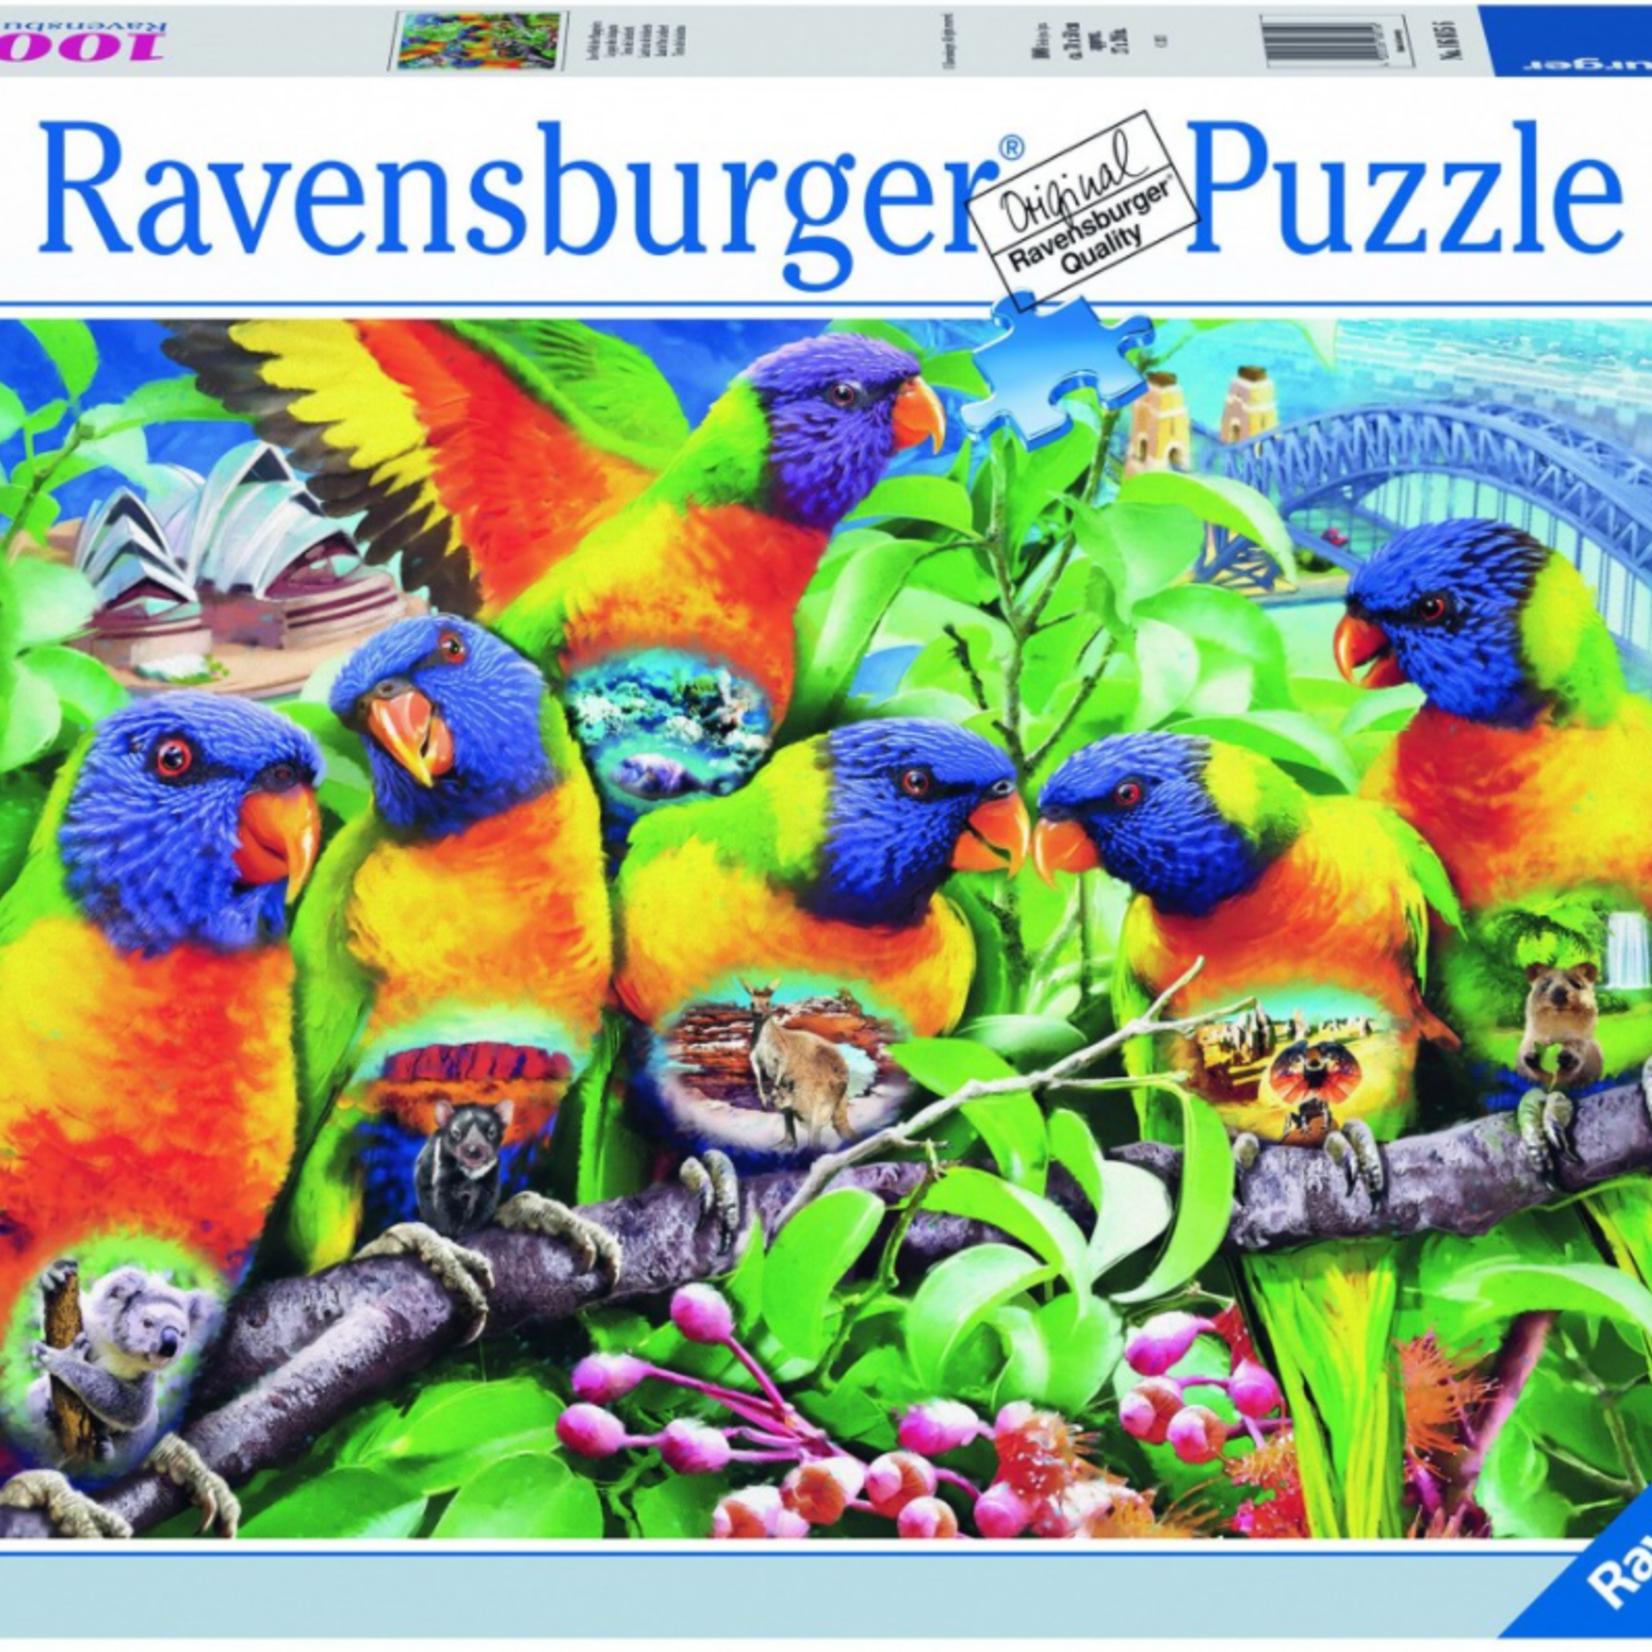 Ravensburger Land of the Lorikeet  - 1000 pc